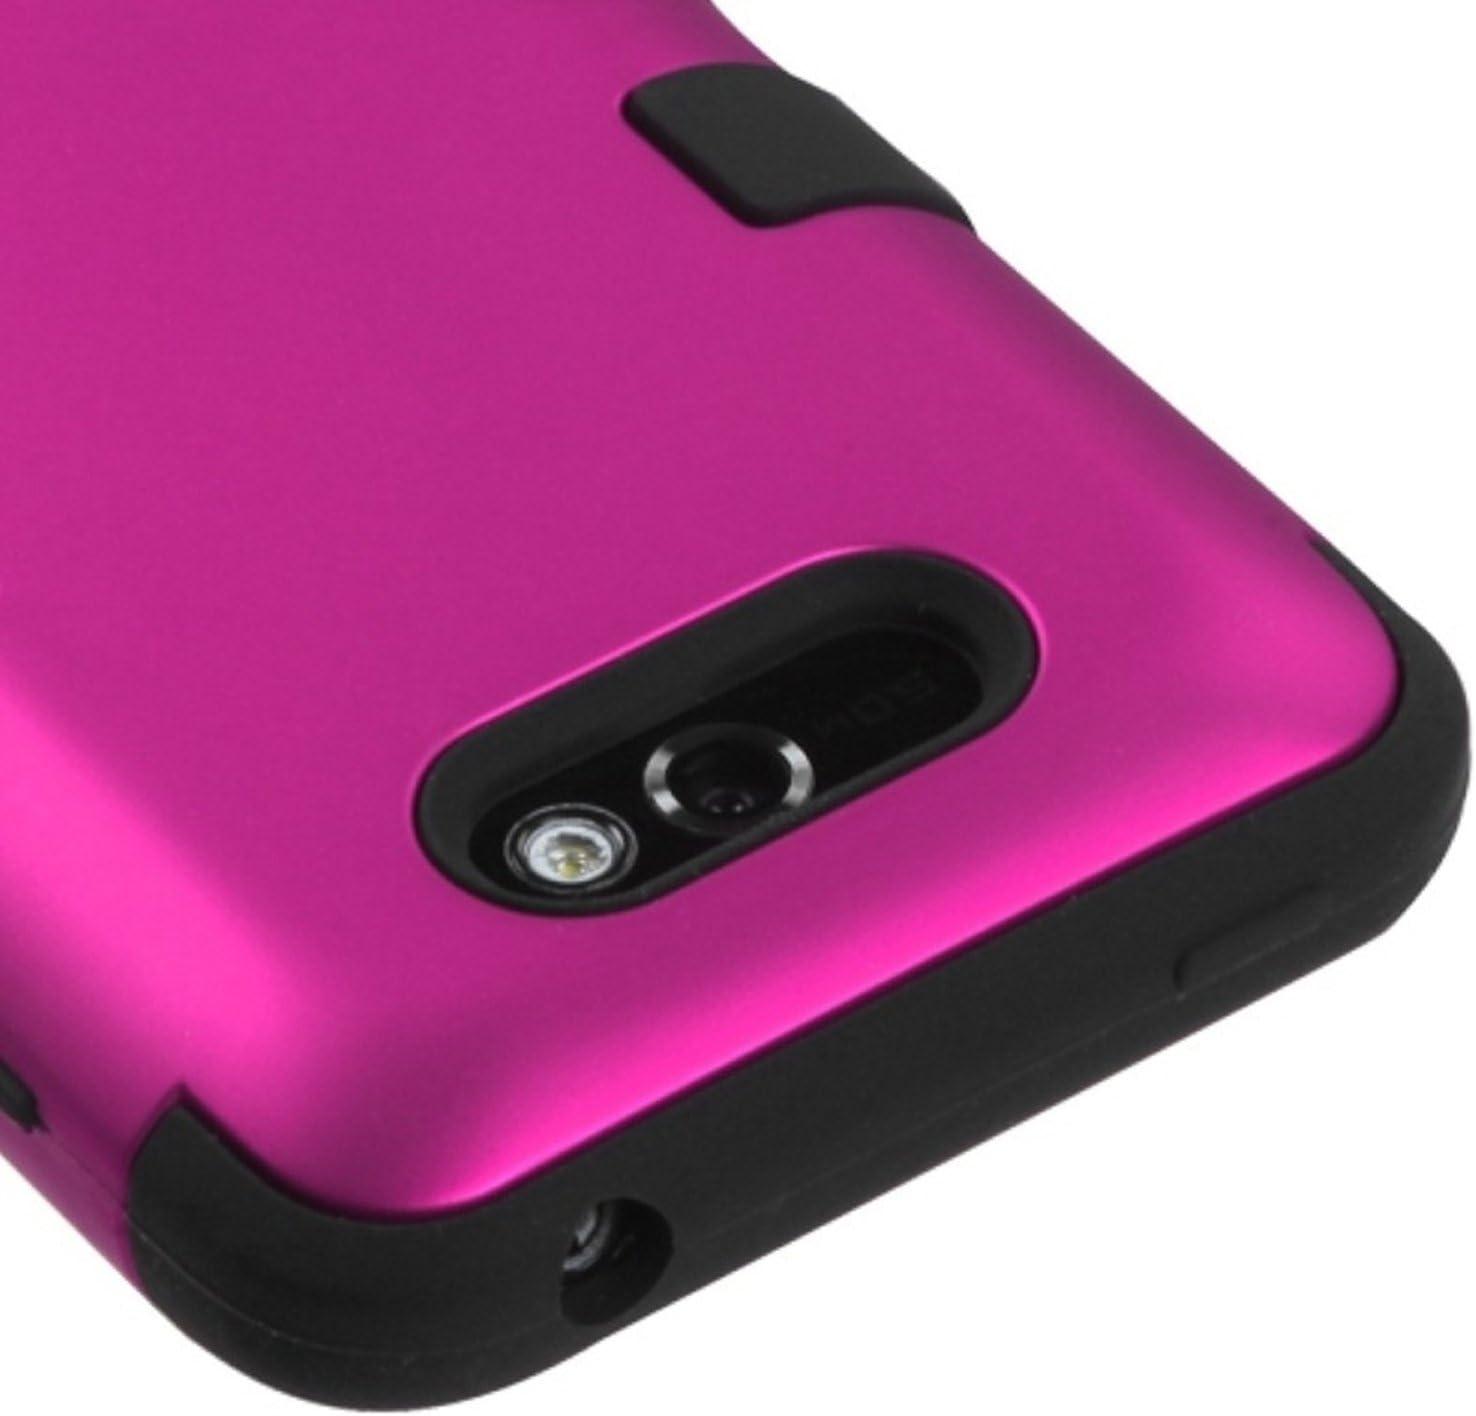 MyBat LGMS770HPCTUFFSO004NP Al sold out. sale Titanium Rugged TUFF Case for Hybrid